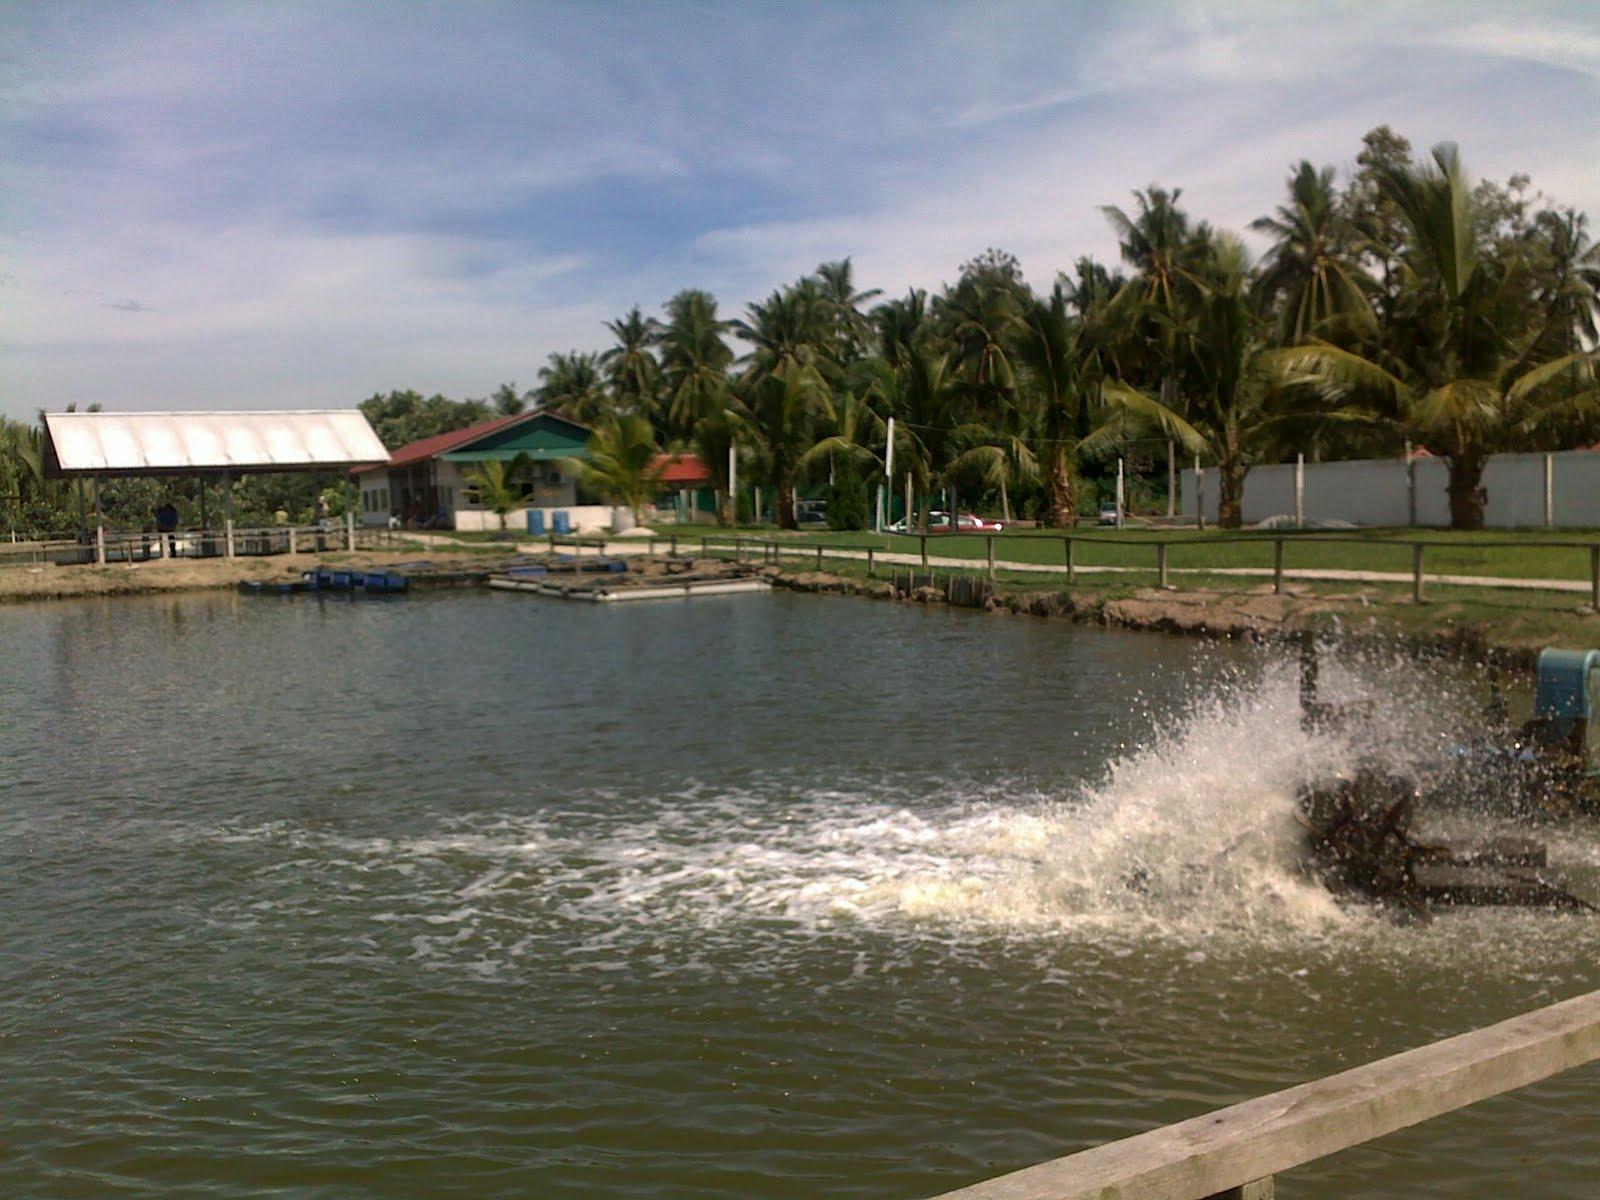 Pandangan penjuru kolam